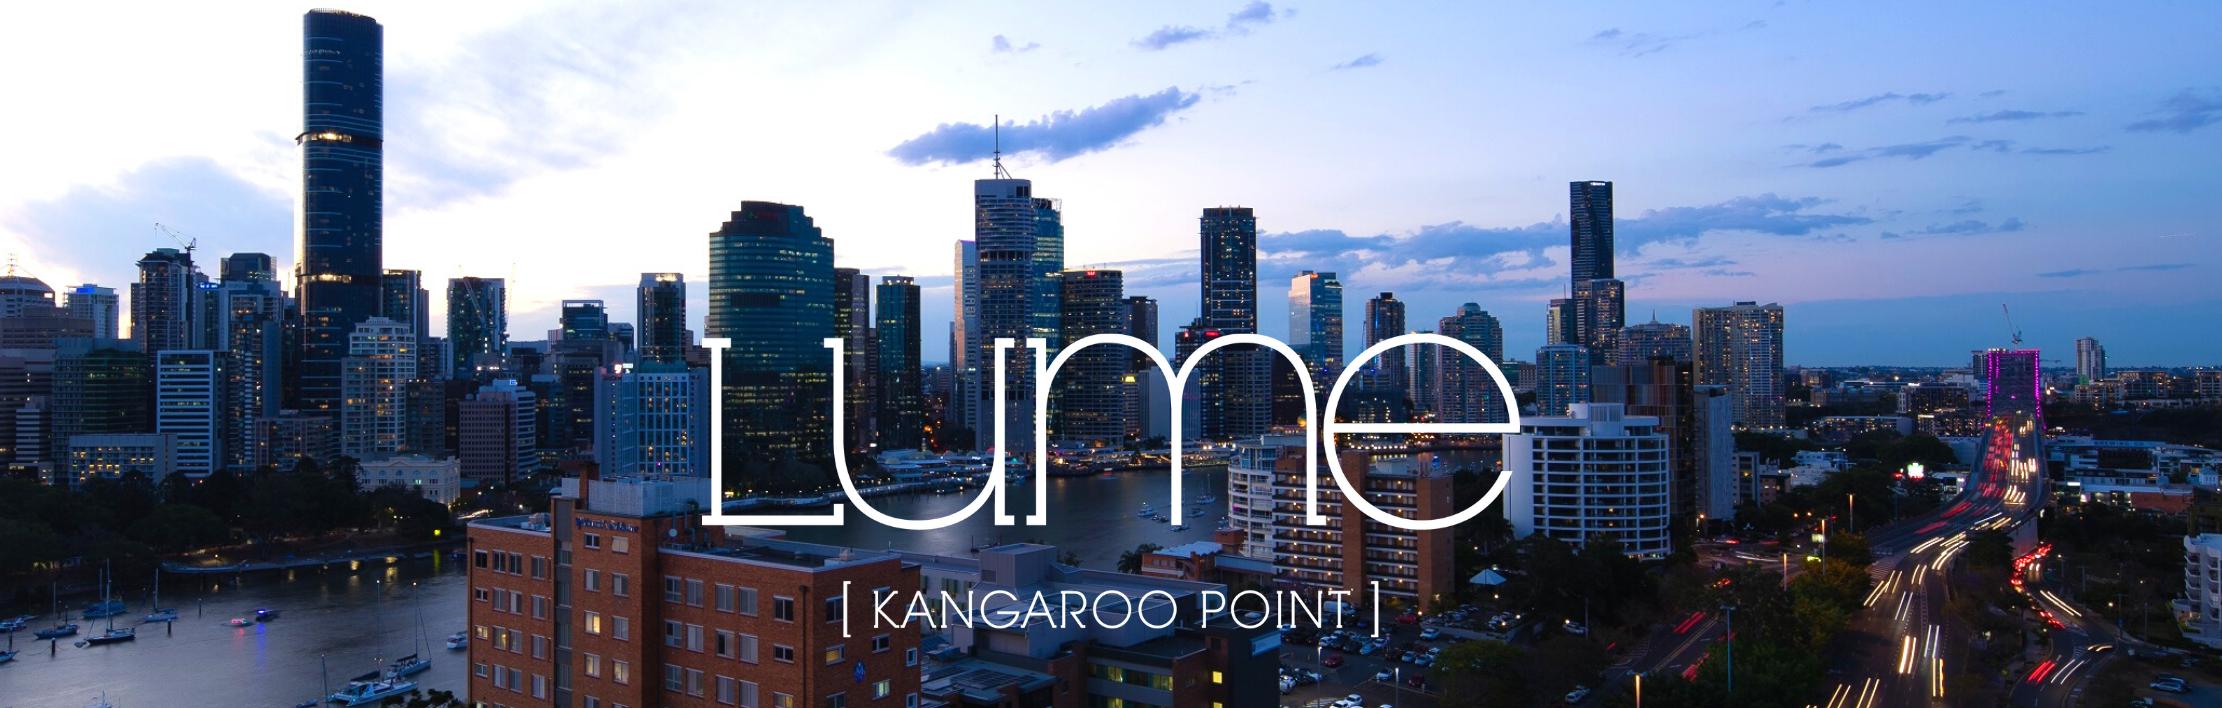 LUME, Kangaroo Point